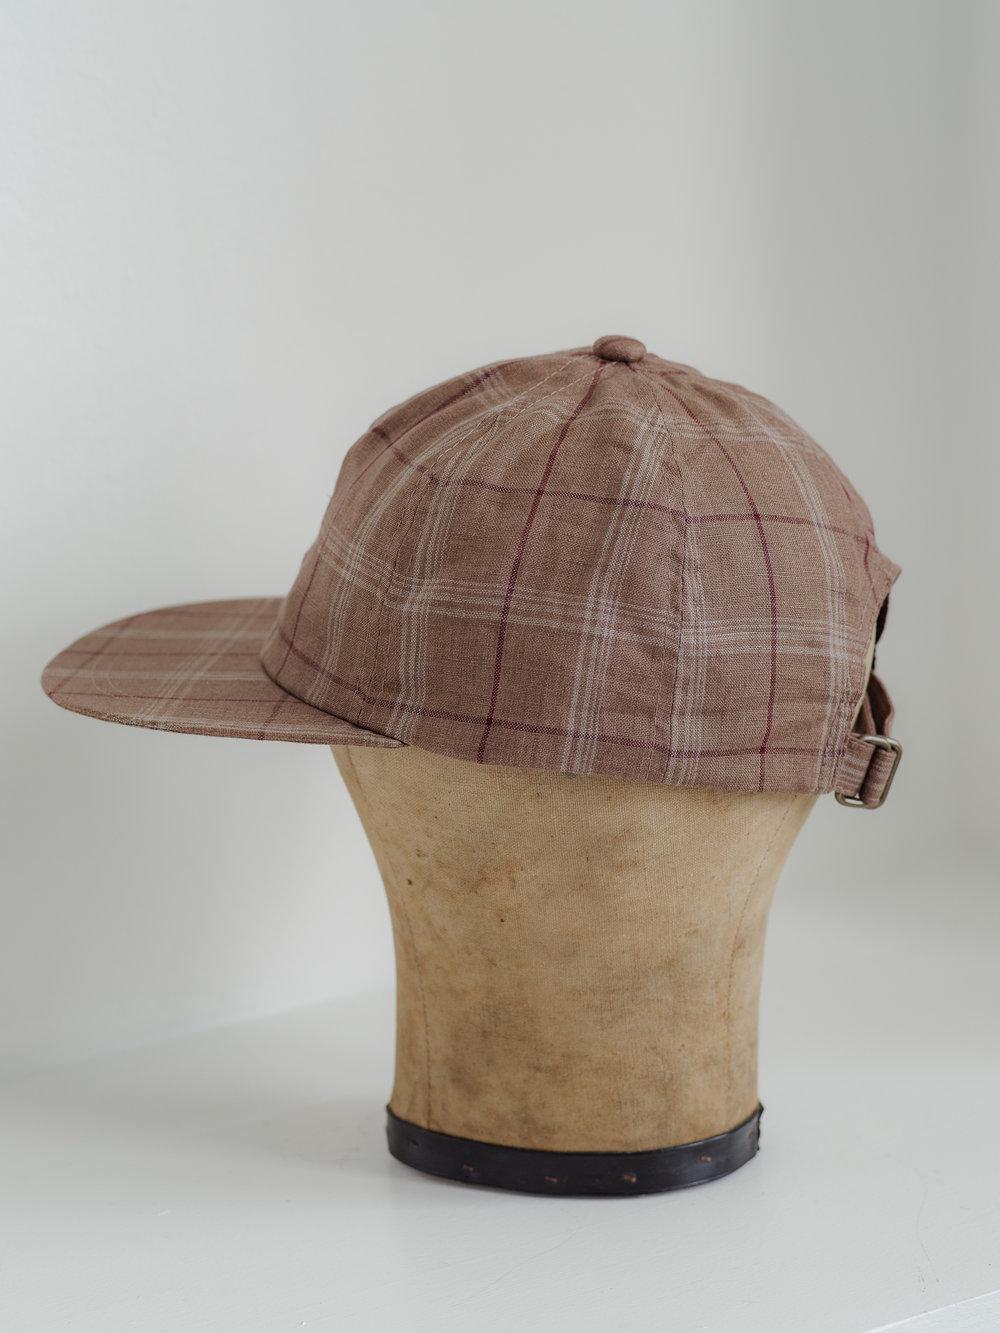 evan-kinori-ouji-yamada-handmade-hat-6